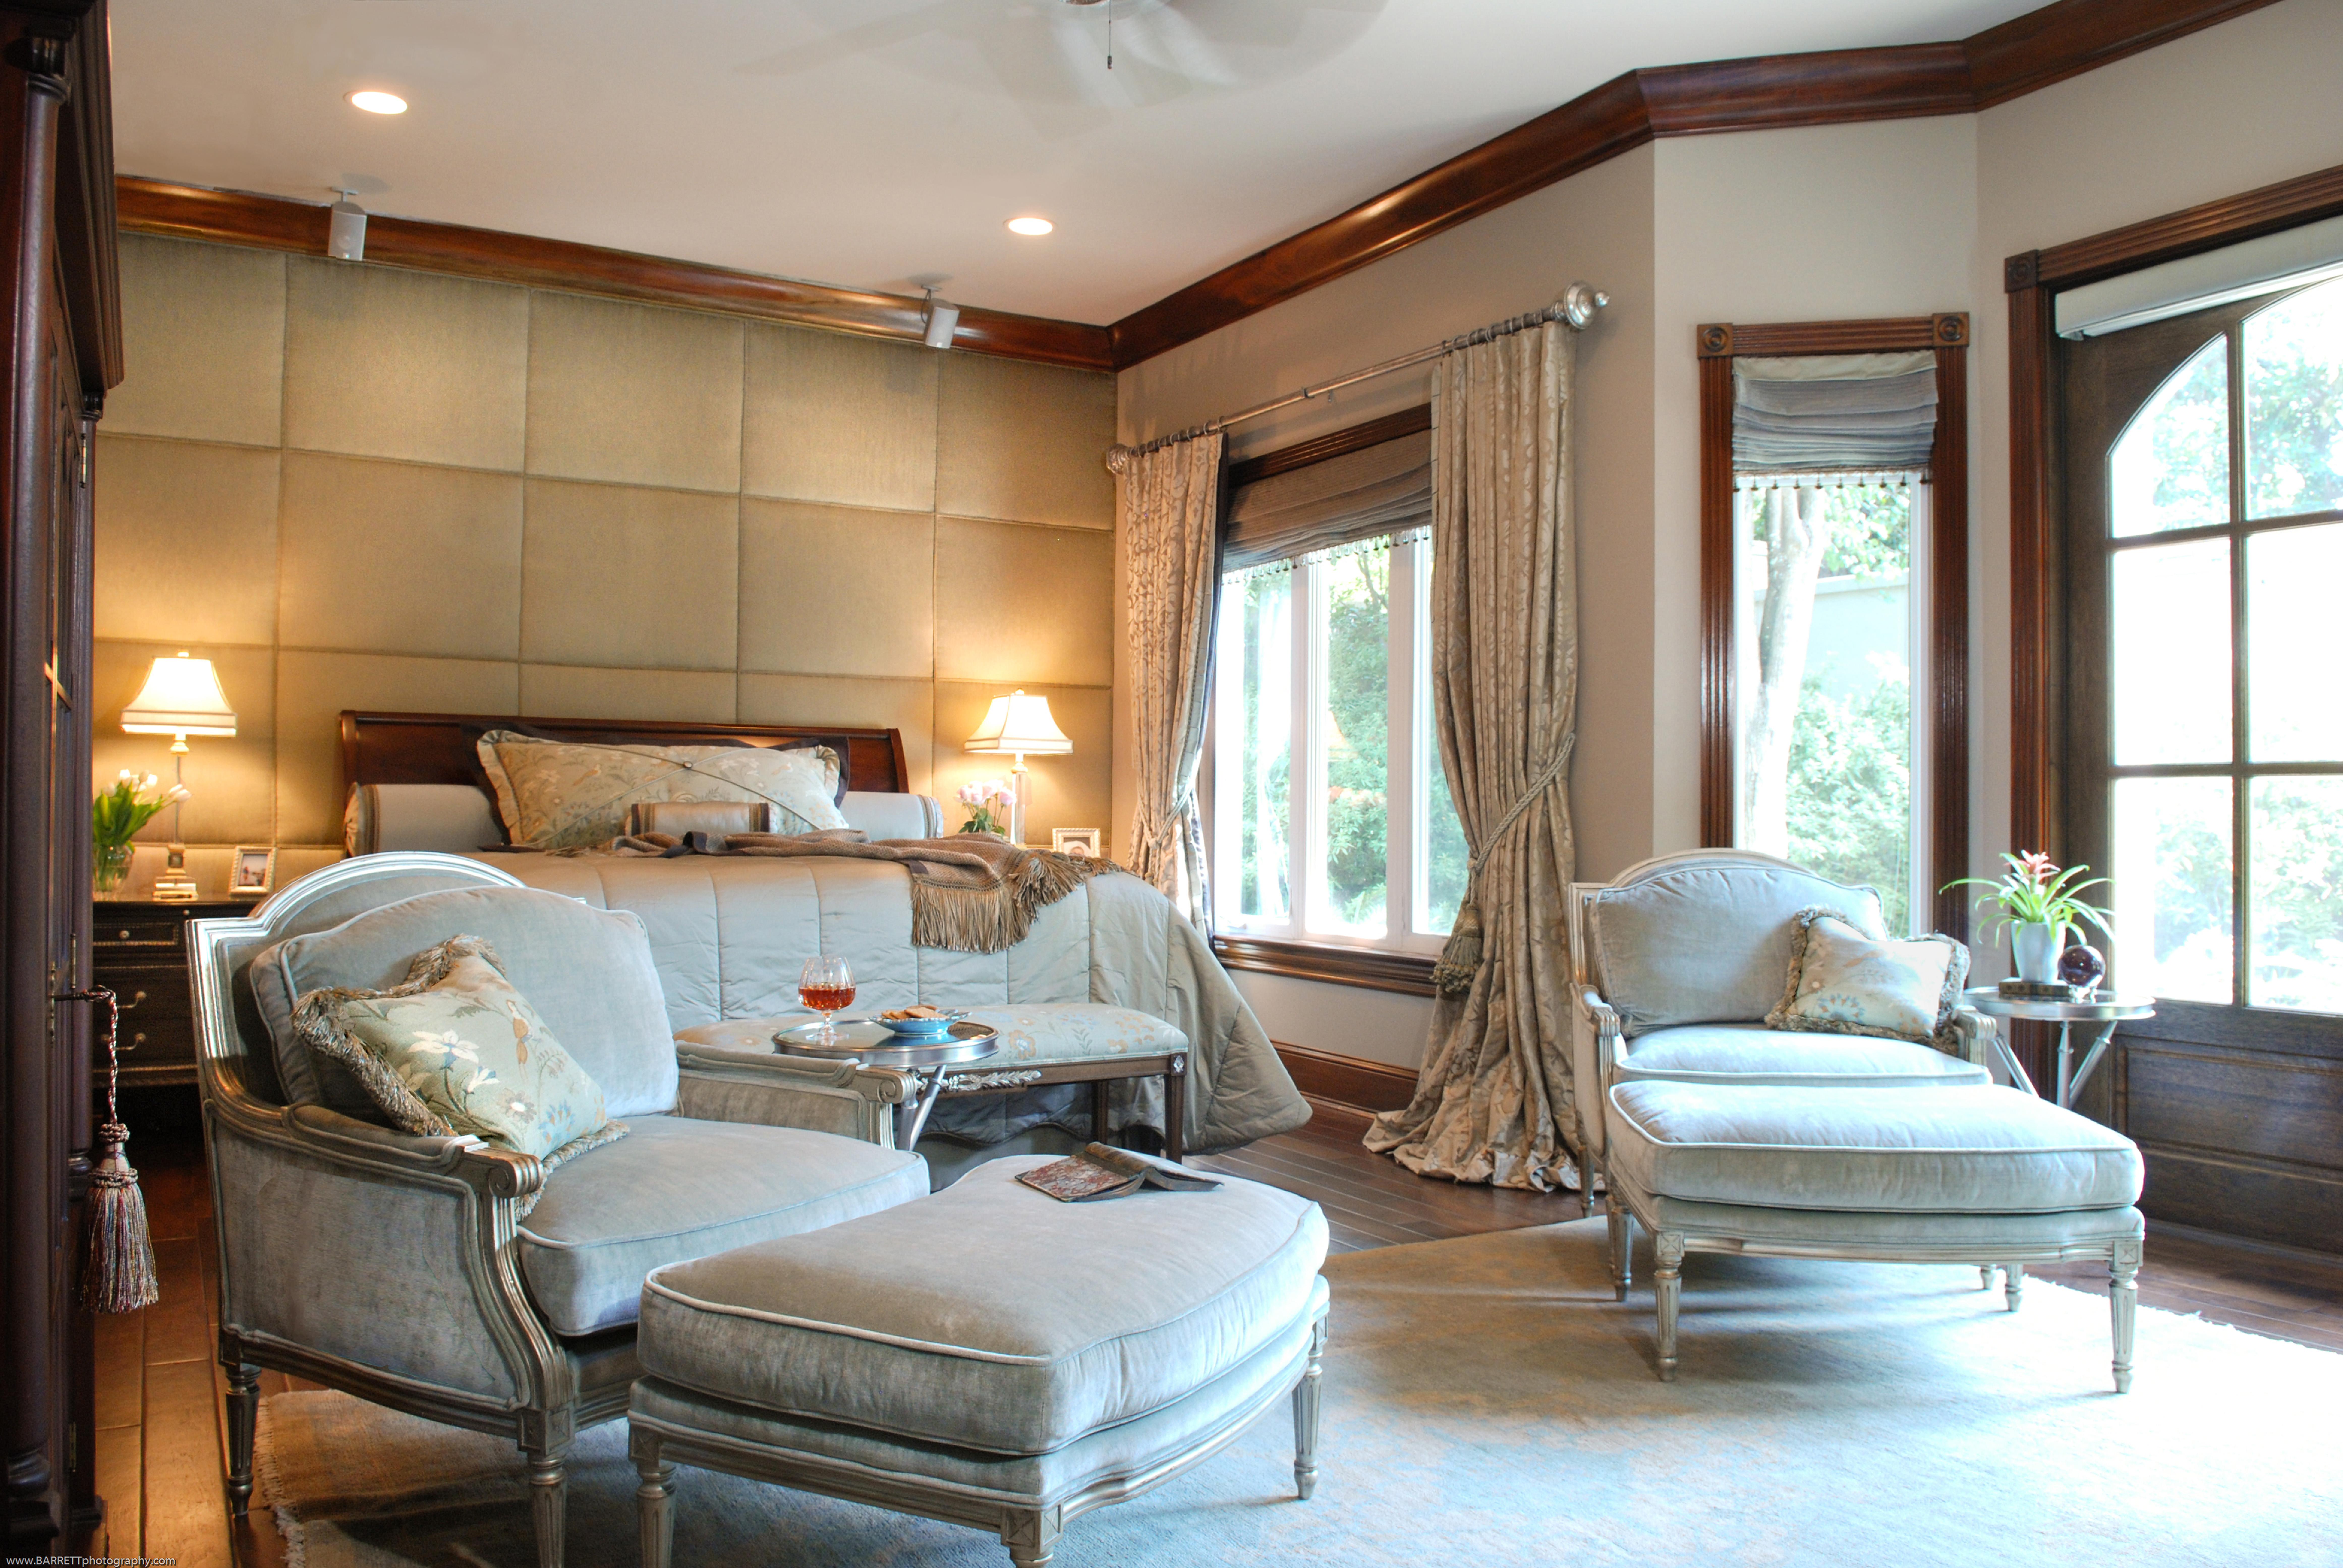 AND THE WINNER ISTHE MOST ROMANTIC BEDROOM IS DESIGNER DINER - Award winning bedroom designs